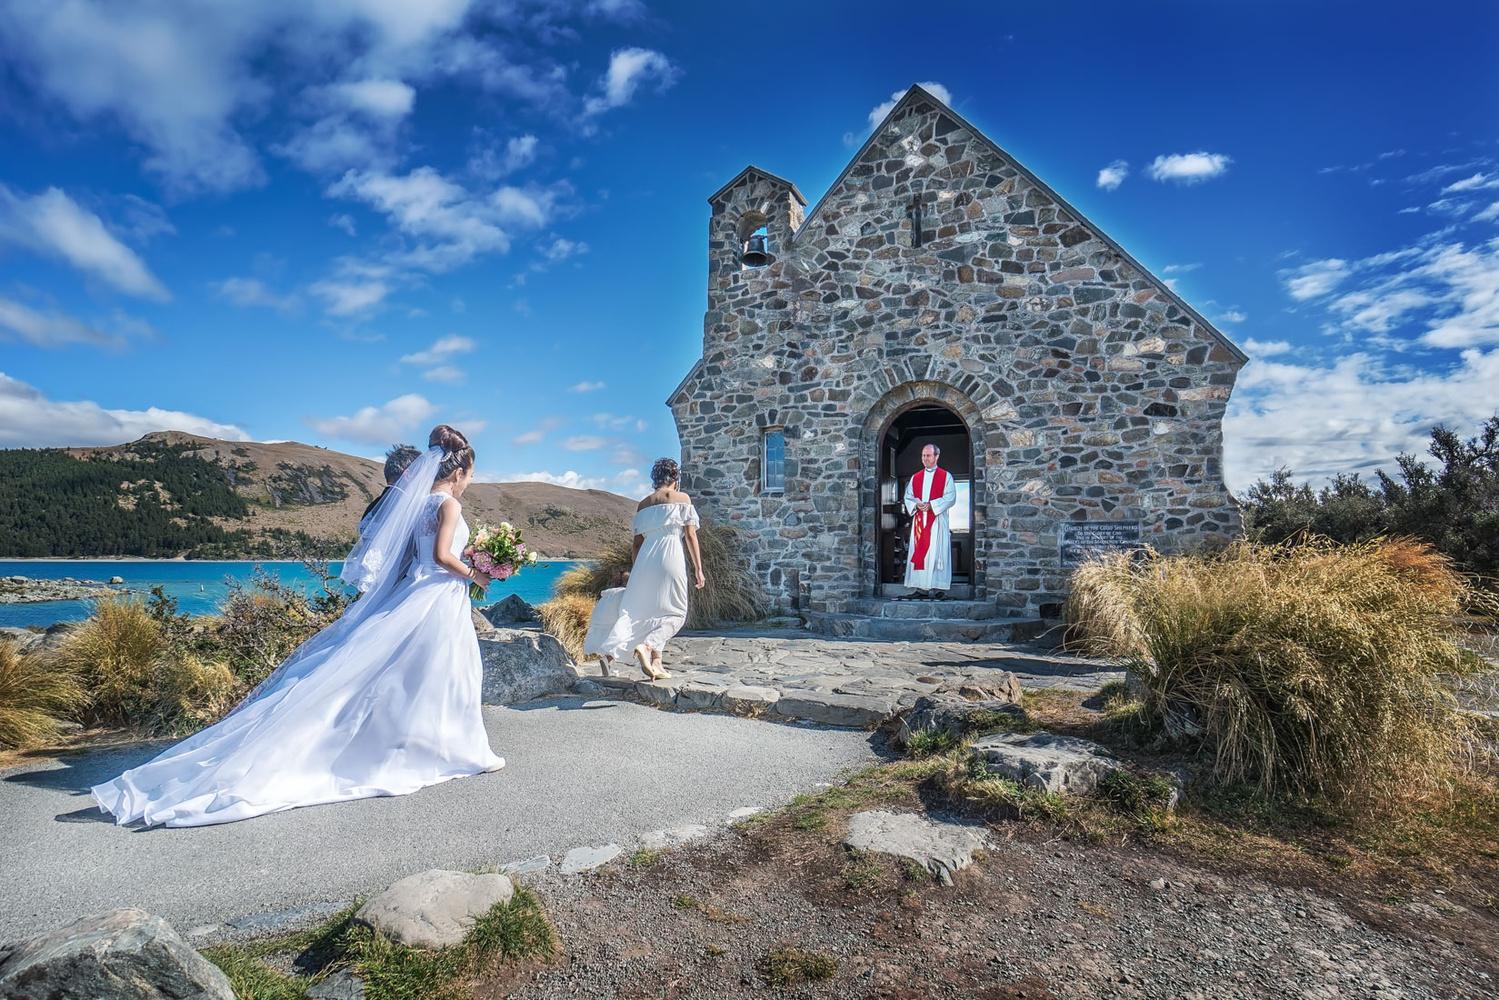 Church of the Good Shepherd Wedding by Keir Briscoe